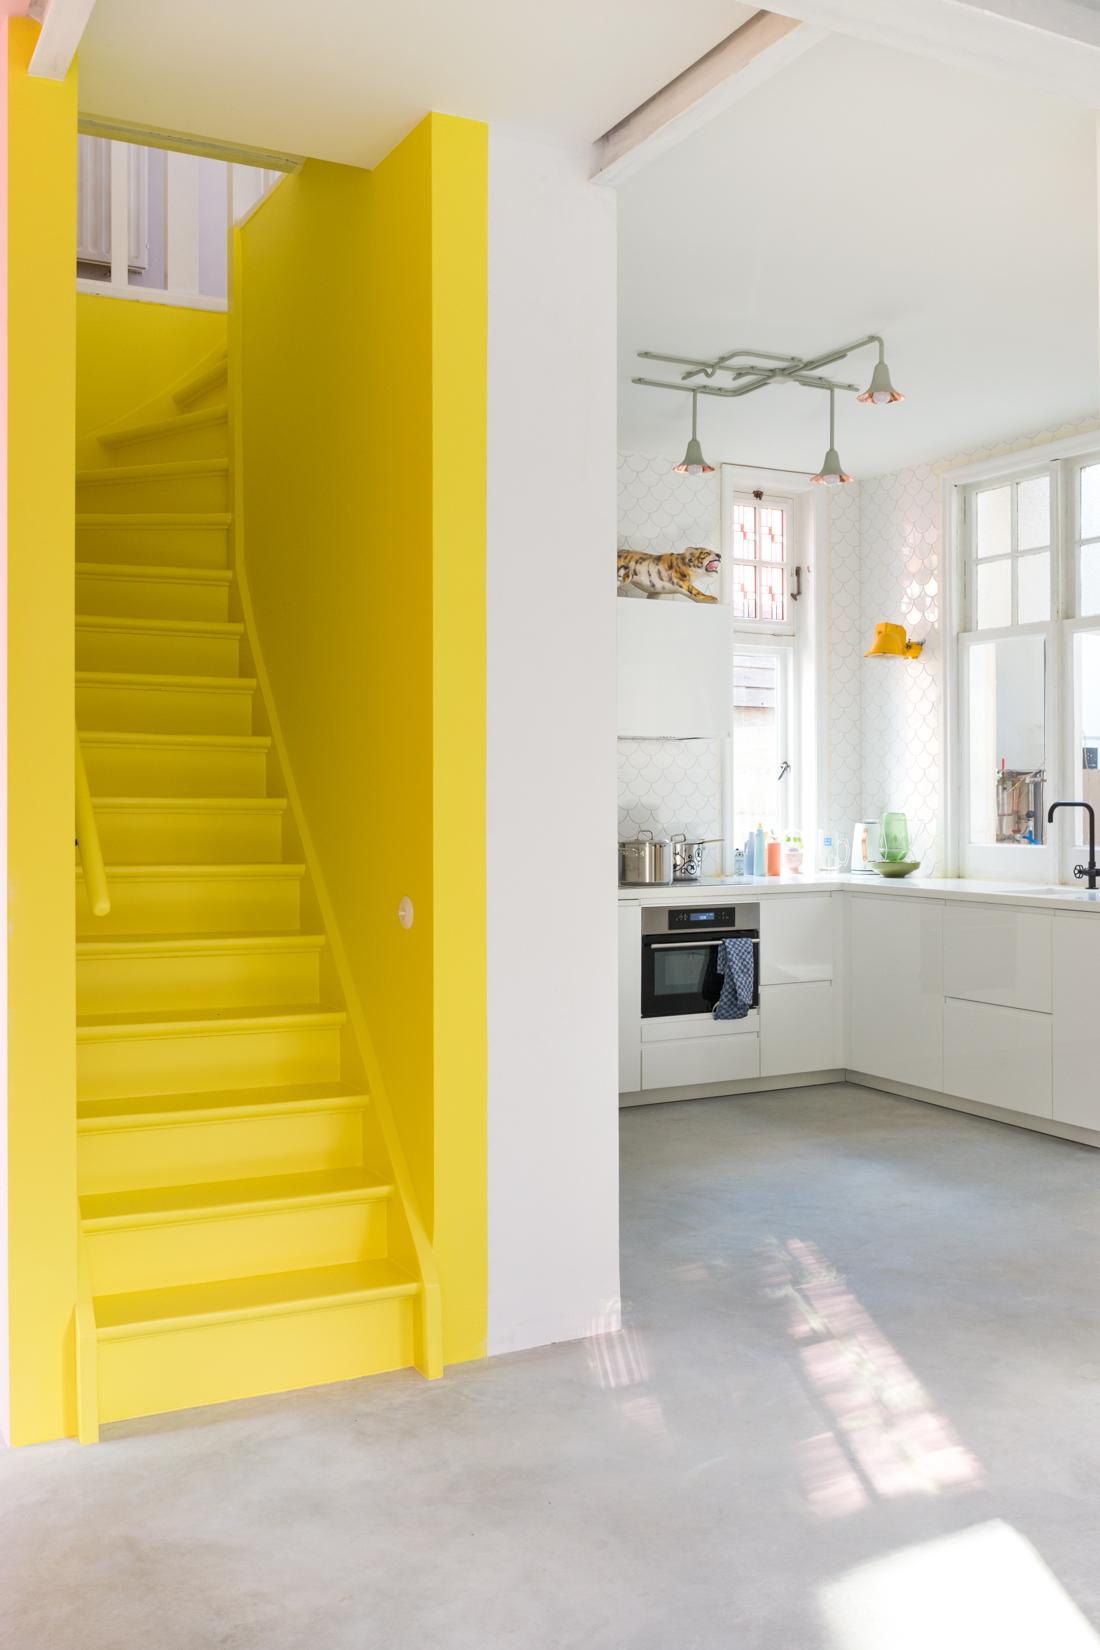 IMAGE: via Anki Wijnen, Zilverblauw. Yellow staircase, concrete floors